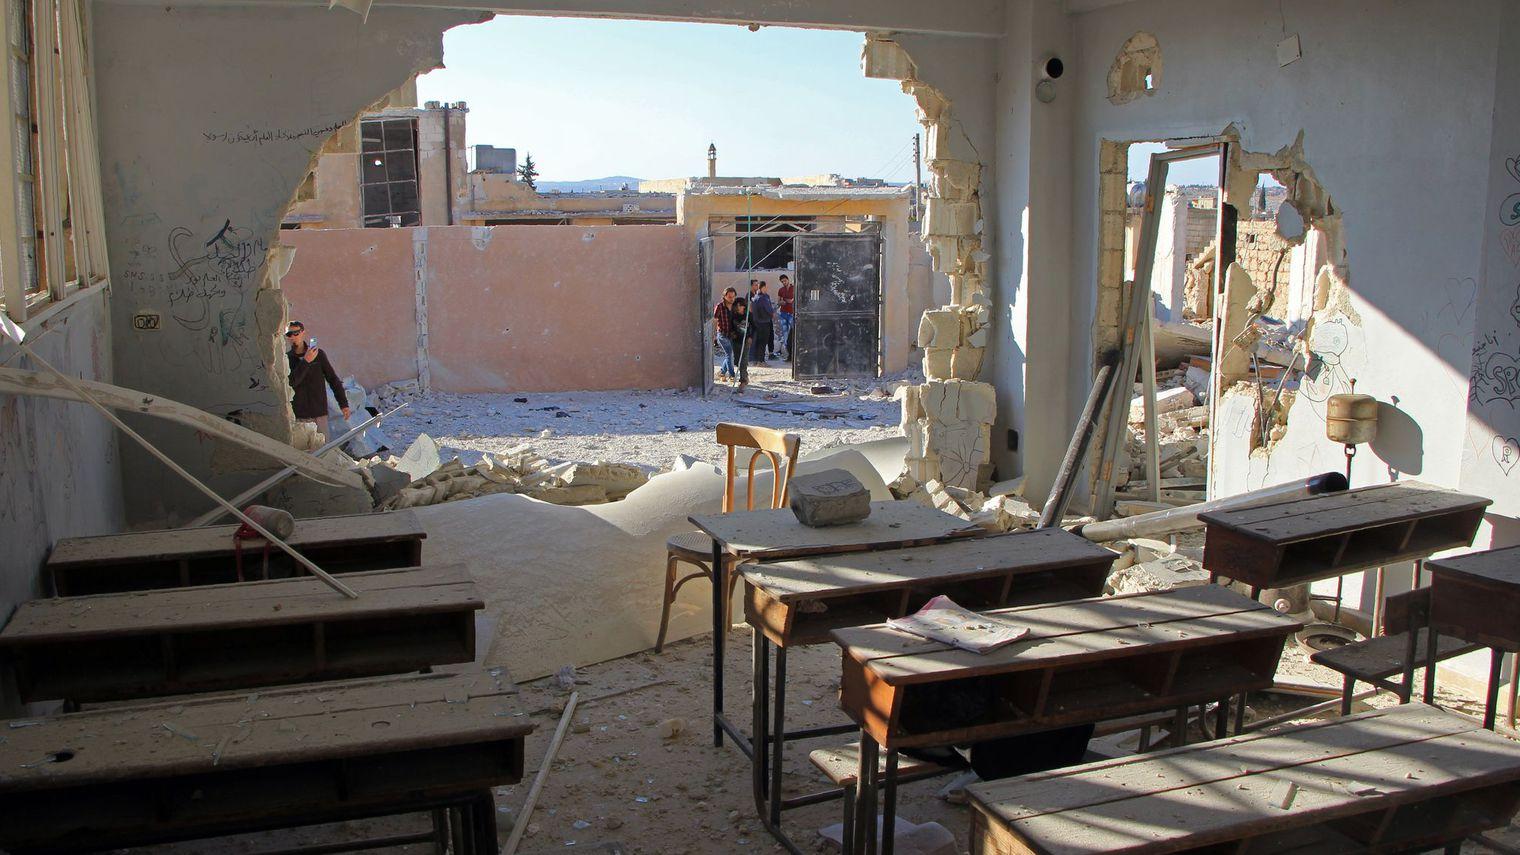 Témoignage: «Il faut former la jeunesse qui sera la Syrie de demain!»